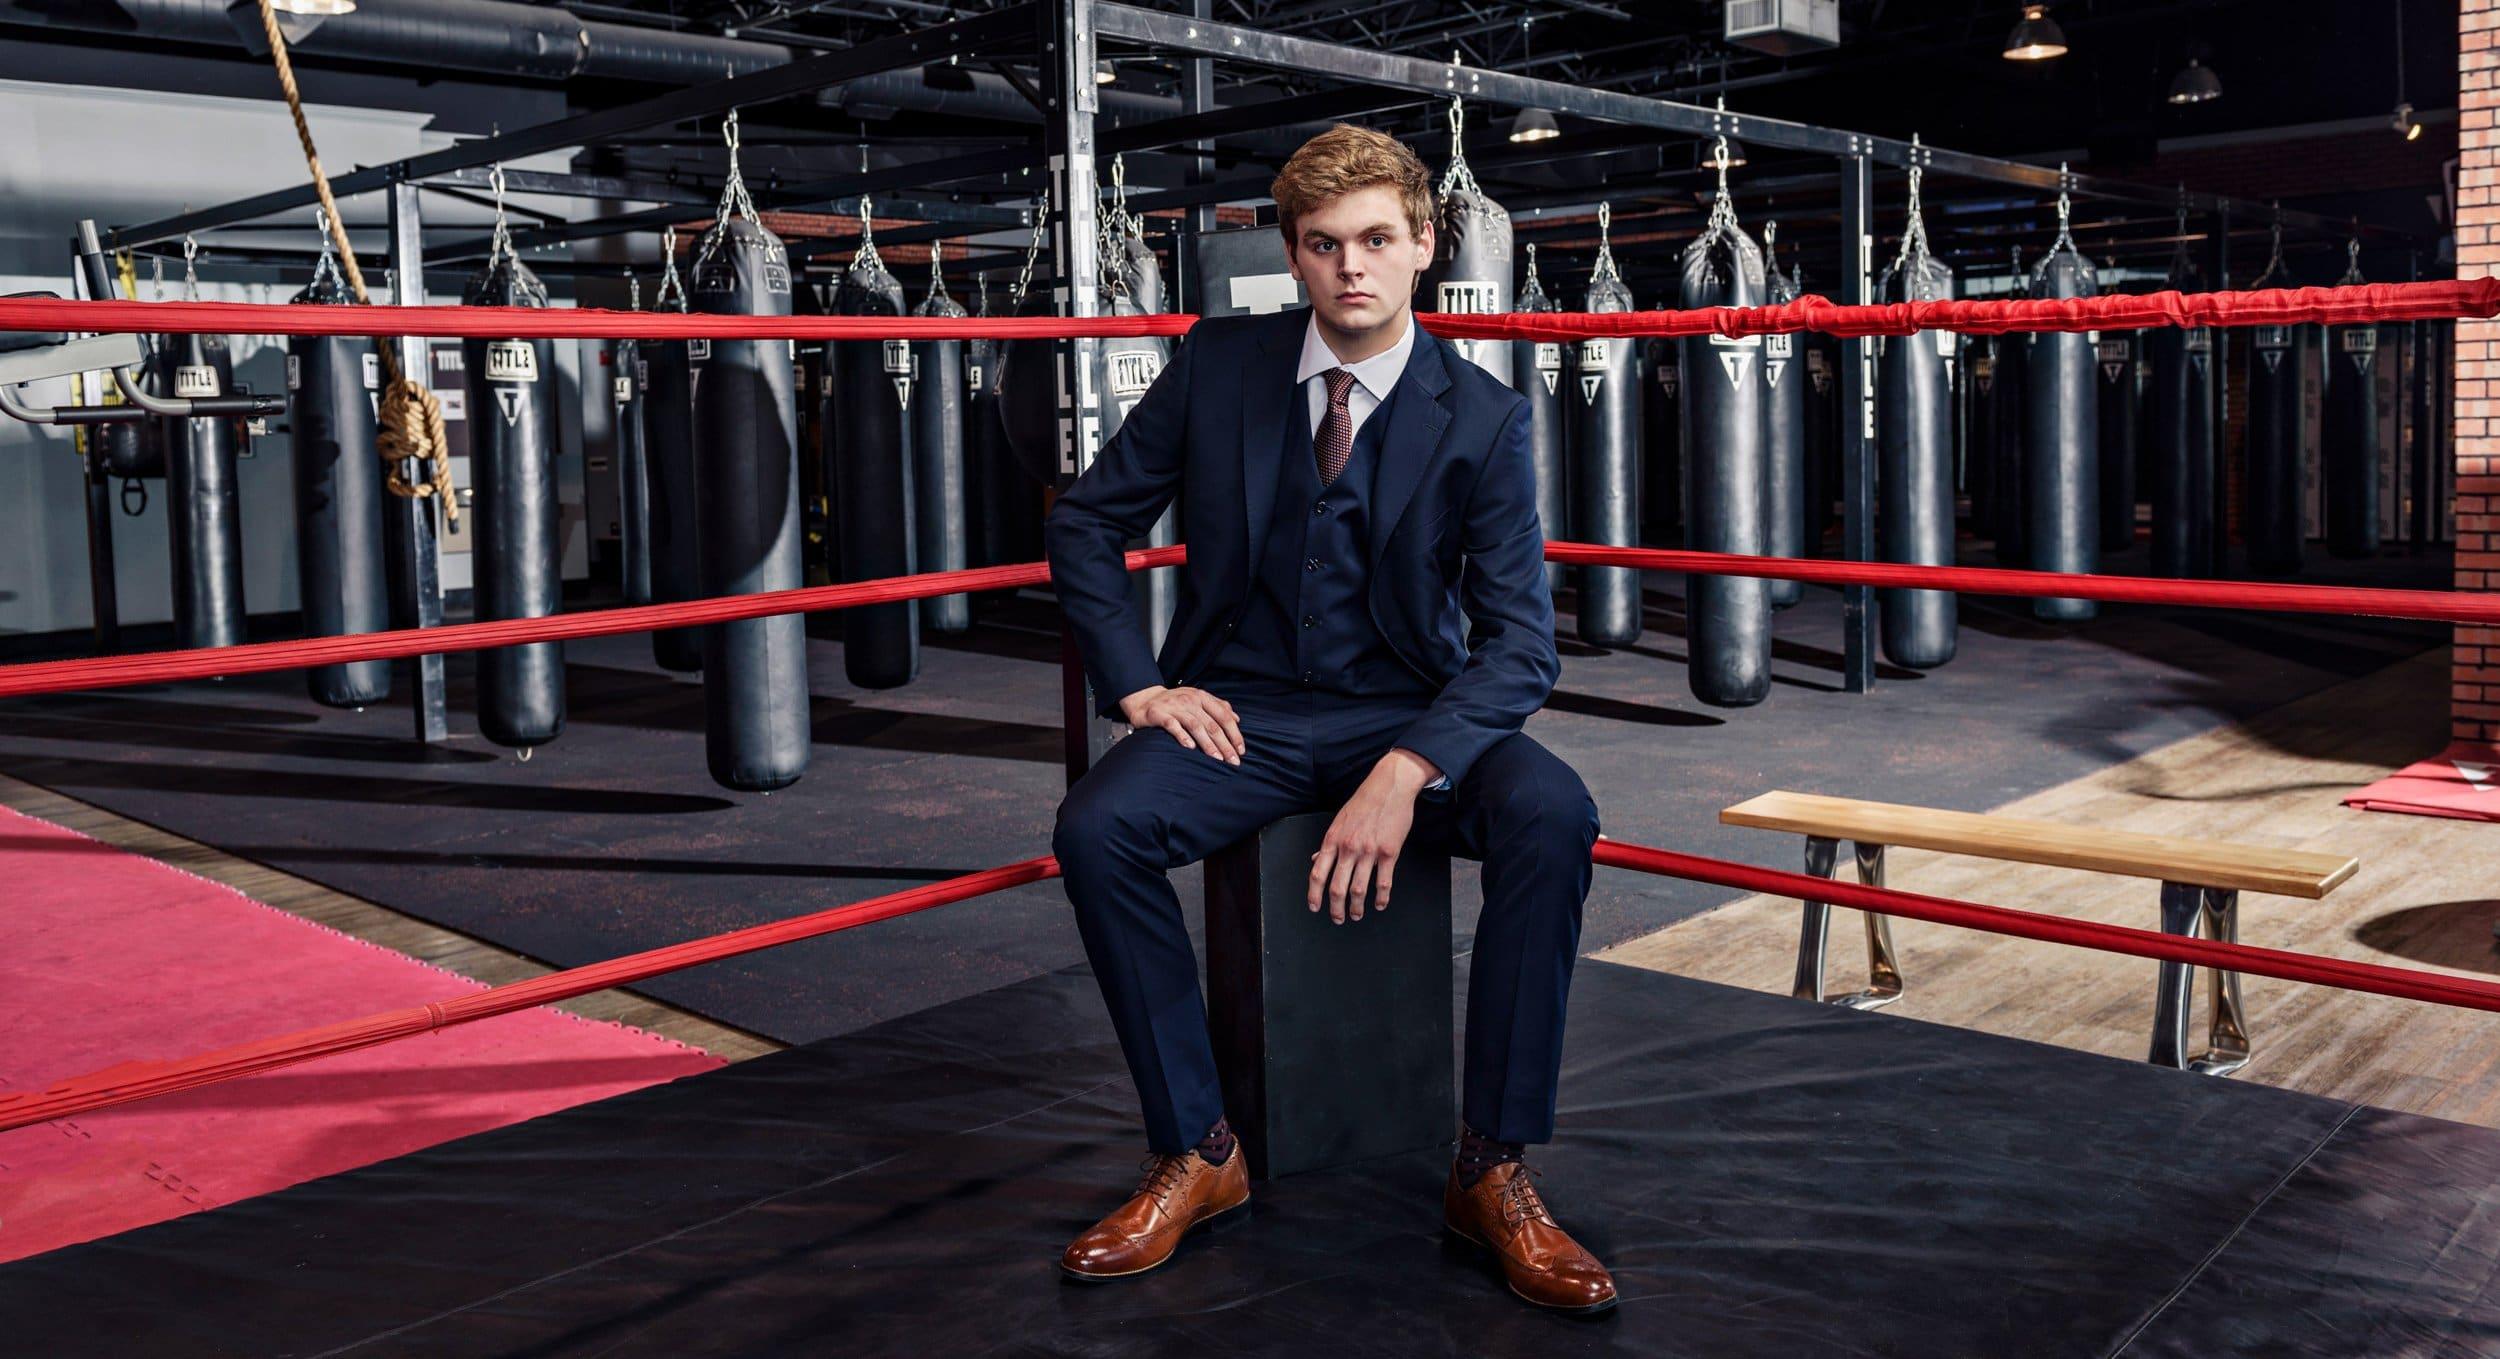 Dallas sports portraits of plano senior high boxing in gym in mckinney tx